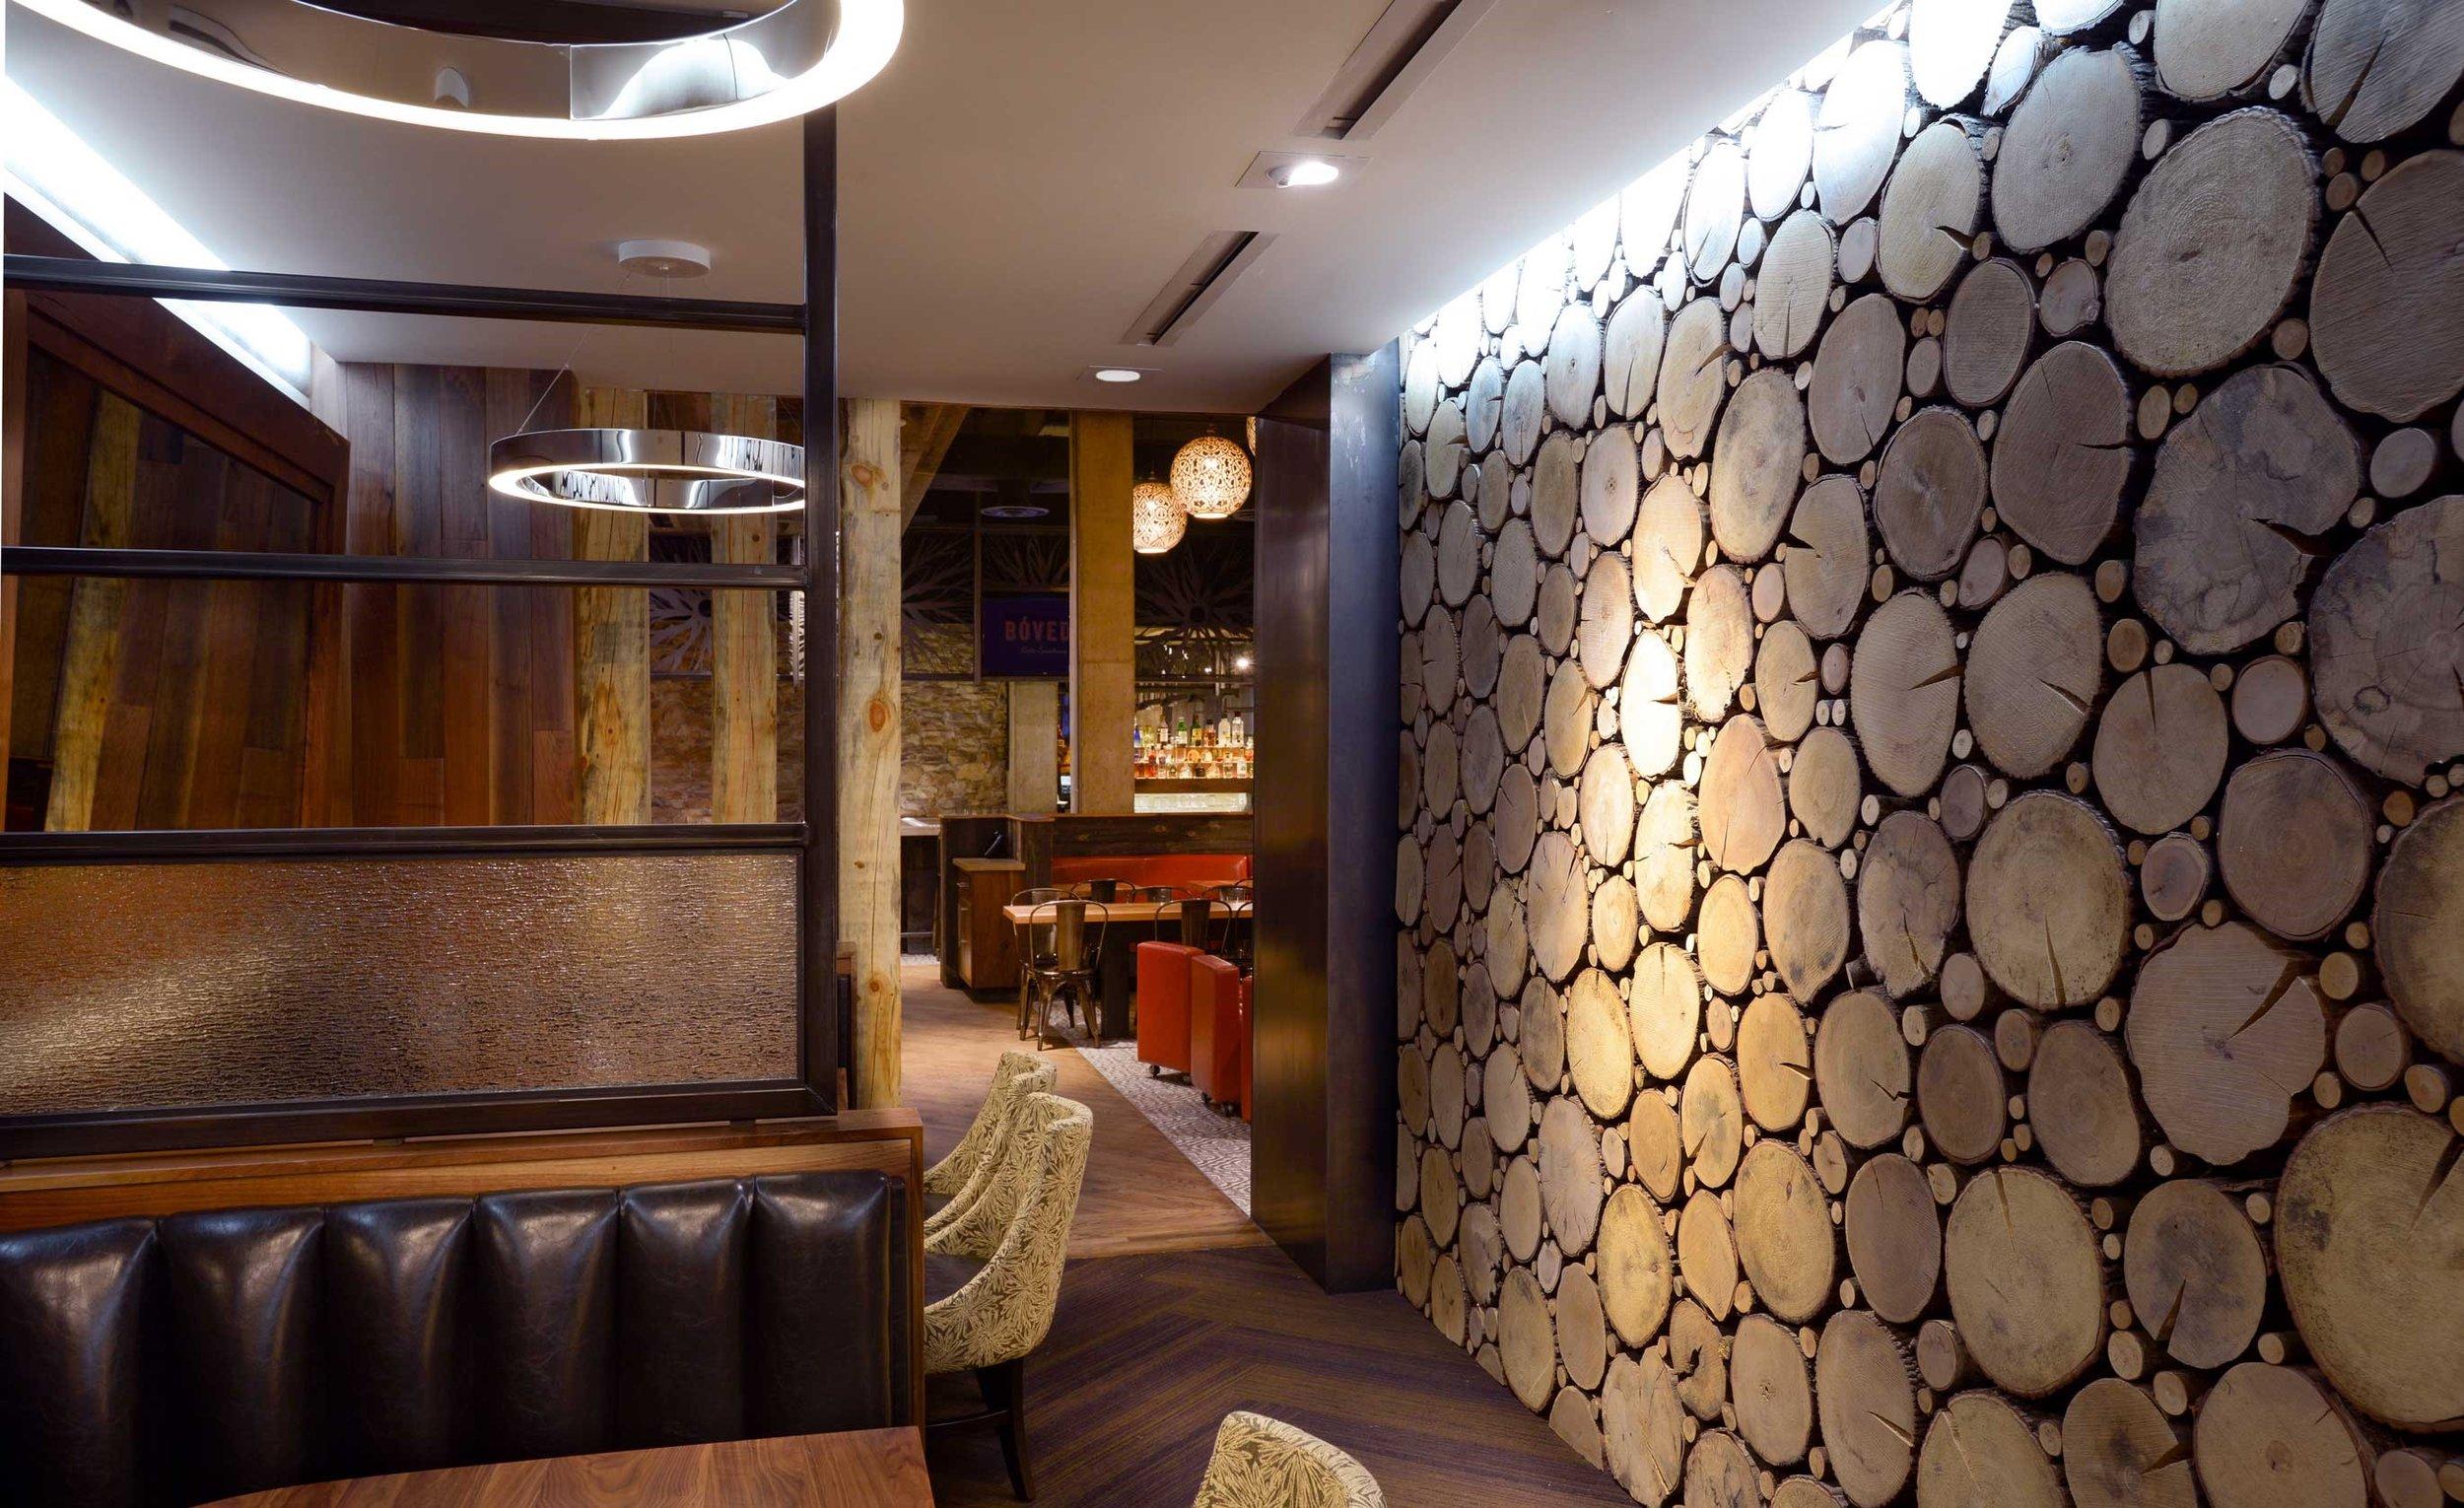 studio-saint-bars-and-restaurants-boveda-washington-dc-10